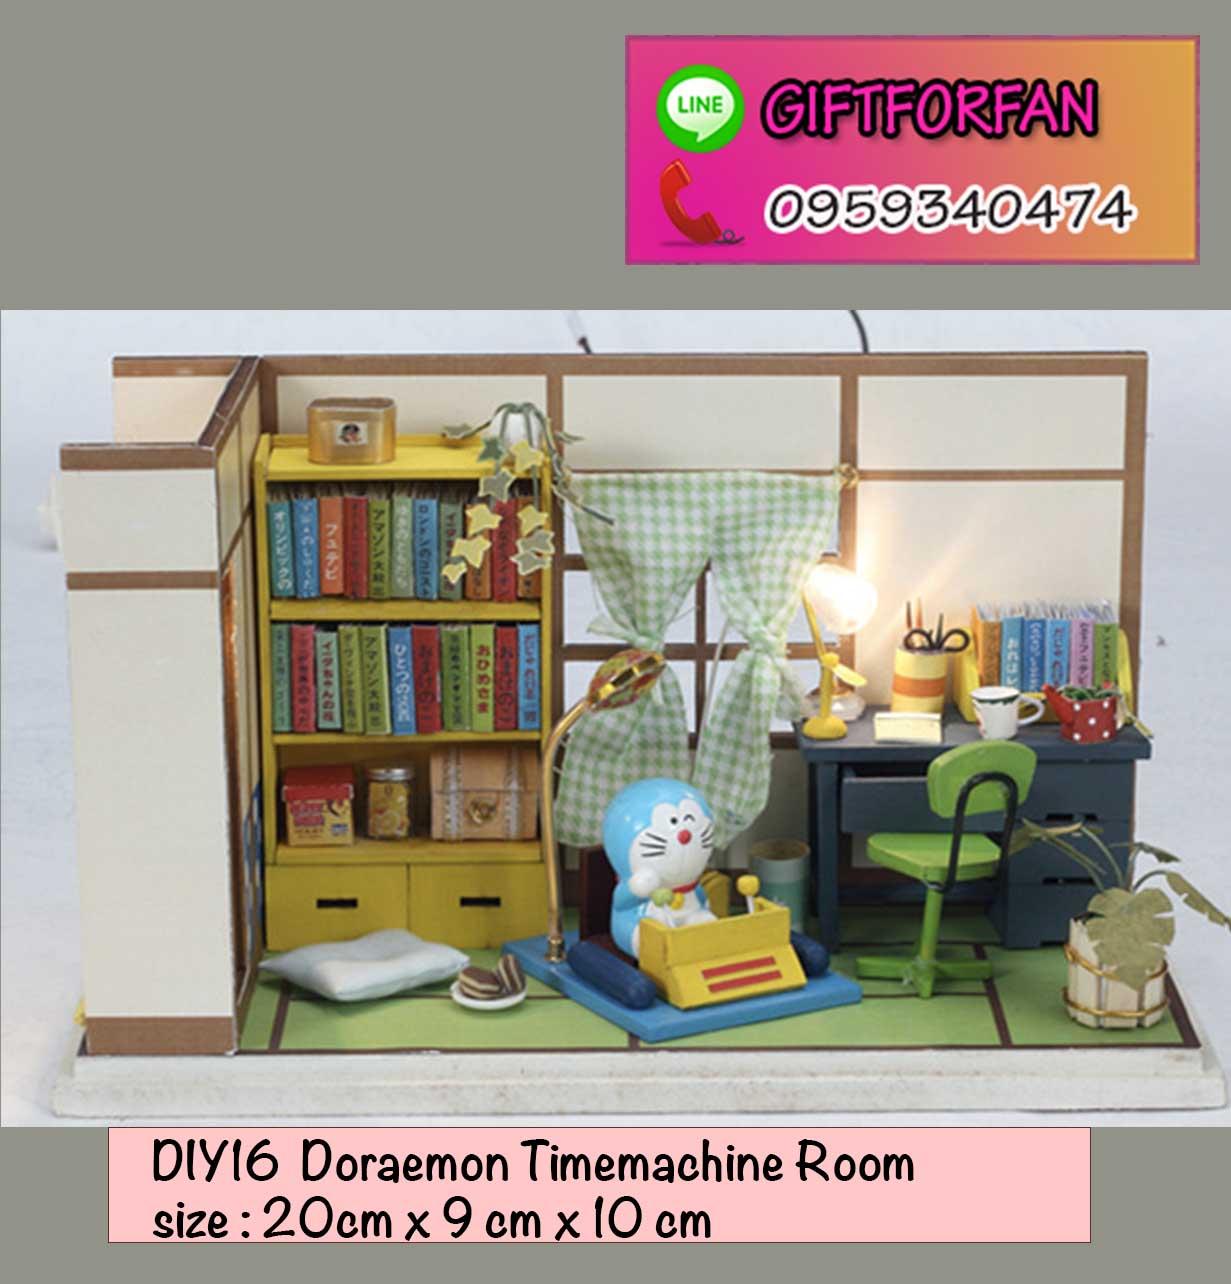 Diy16 doraemon timemachine room diy mini house - Random things every house needs ...